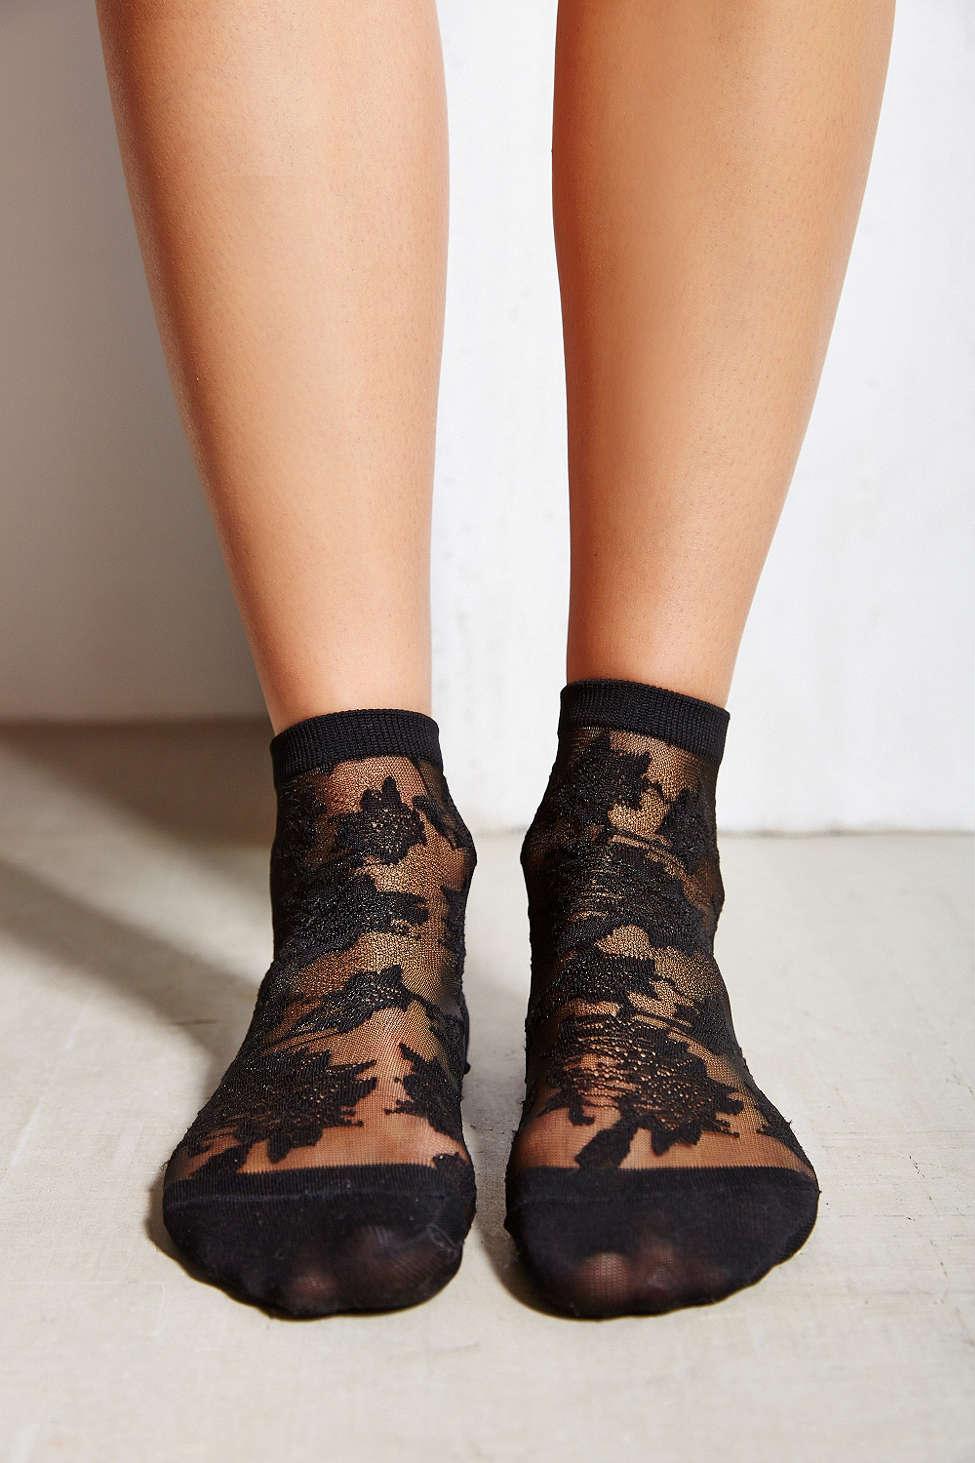 Patterned Sheer Ankle Sock